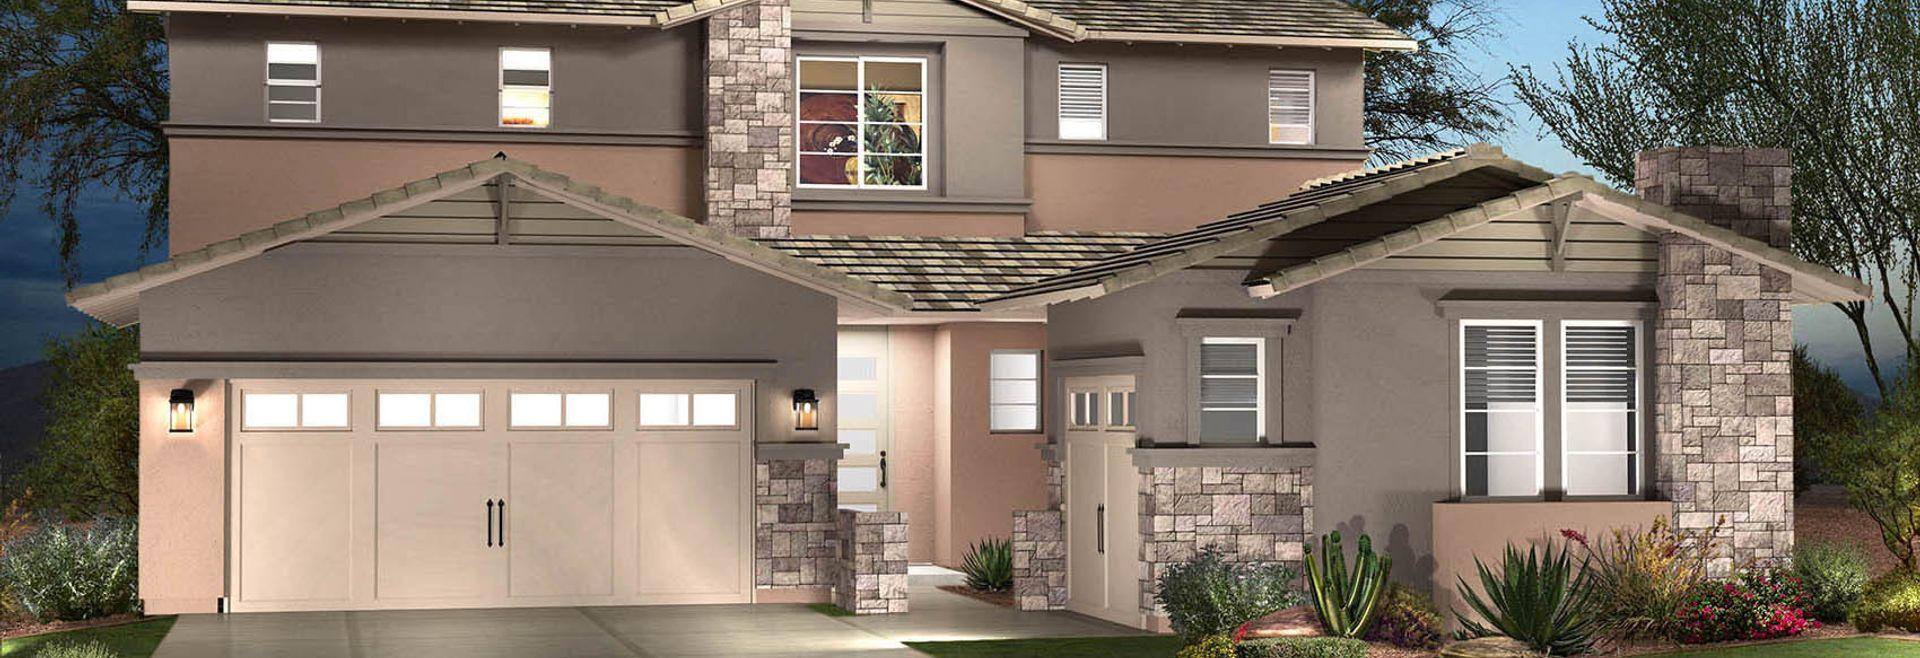 Inspire at Estrella by Shea Homes in Goodyear, Arizona